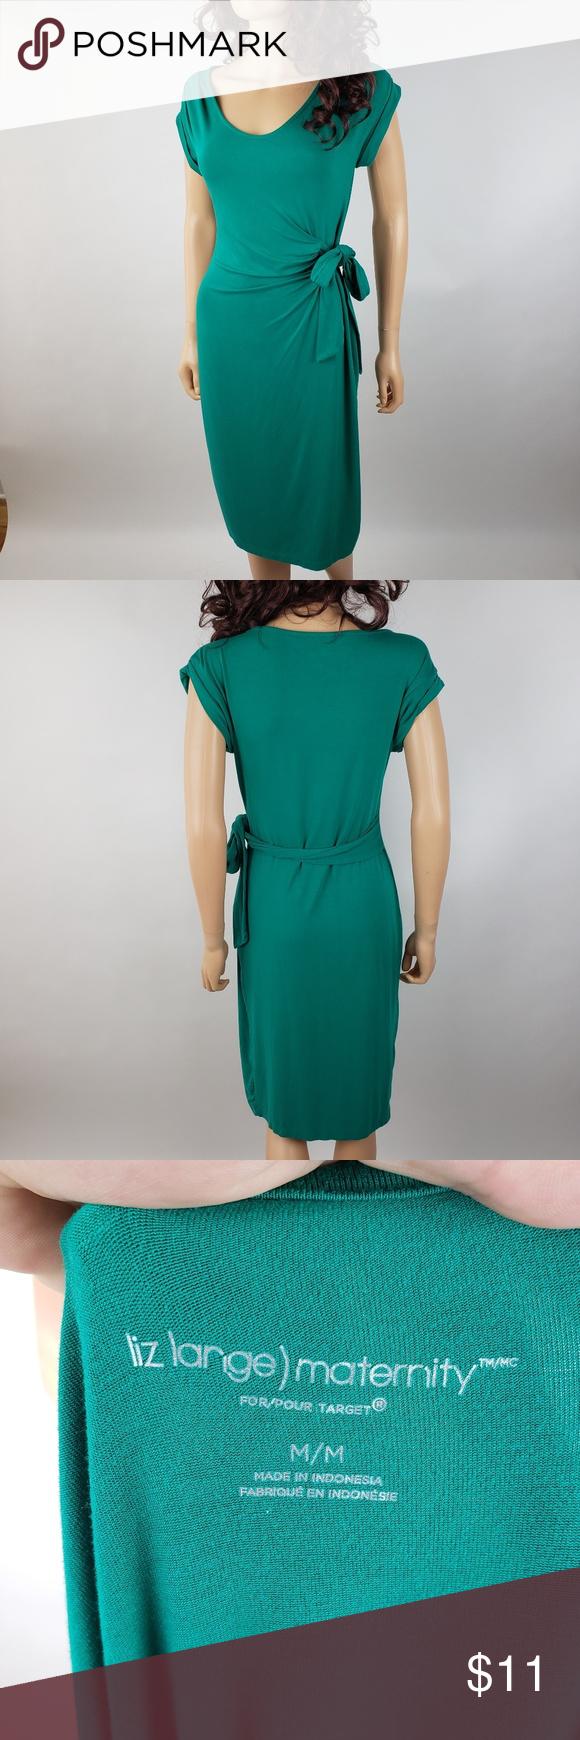 Liz Lang Maternity Green Dress Green Dress Target Maternity Dresses [ 1740 x 580 Pixel ]